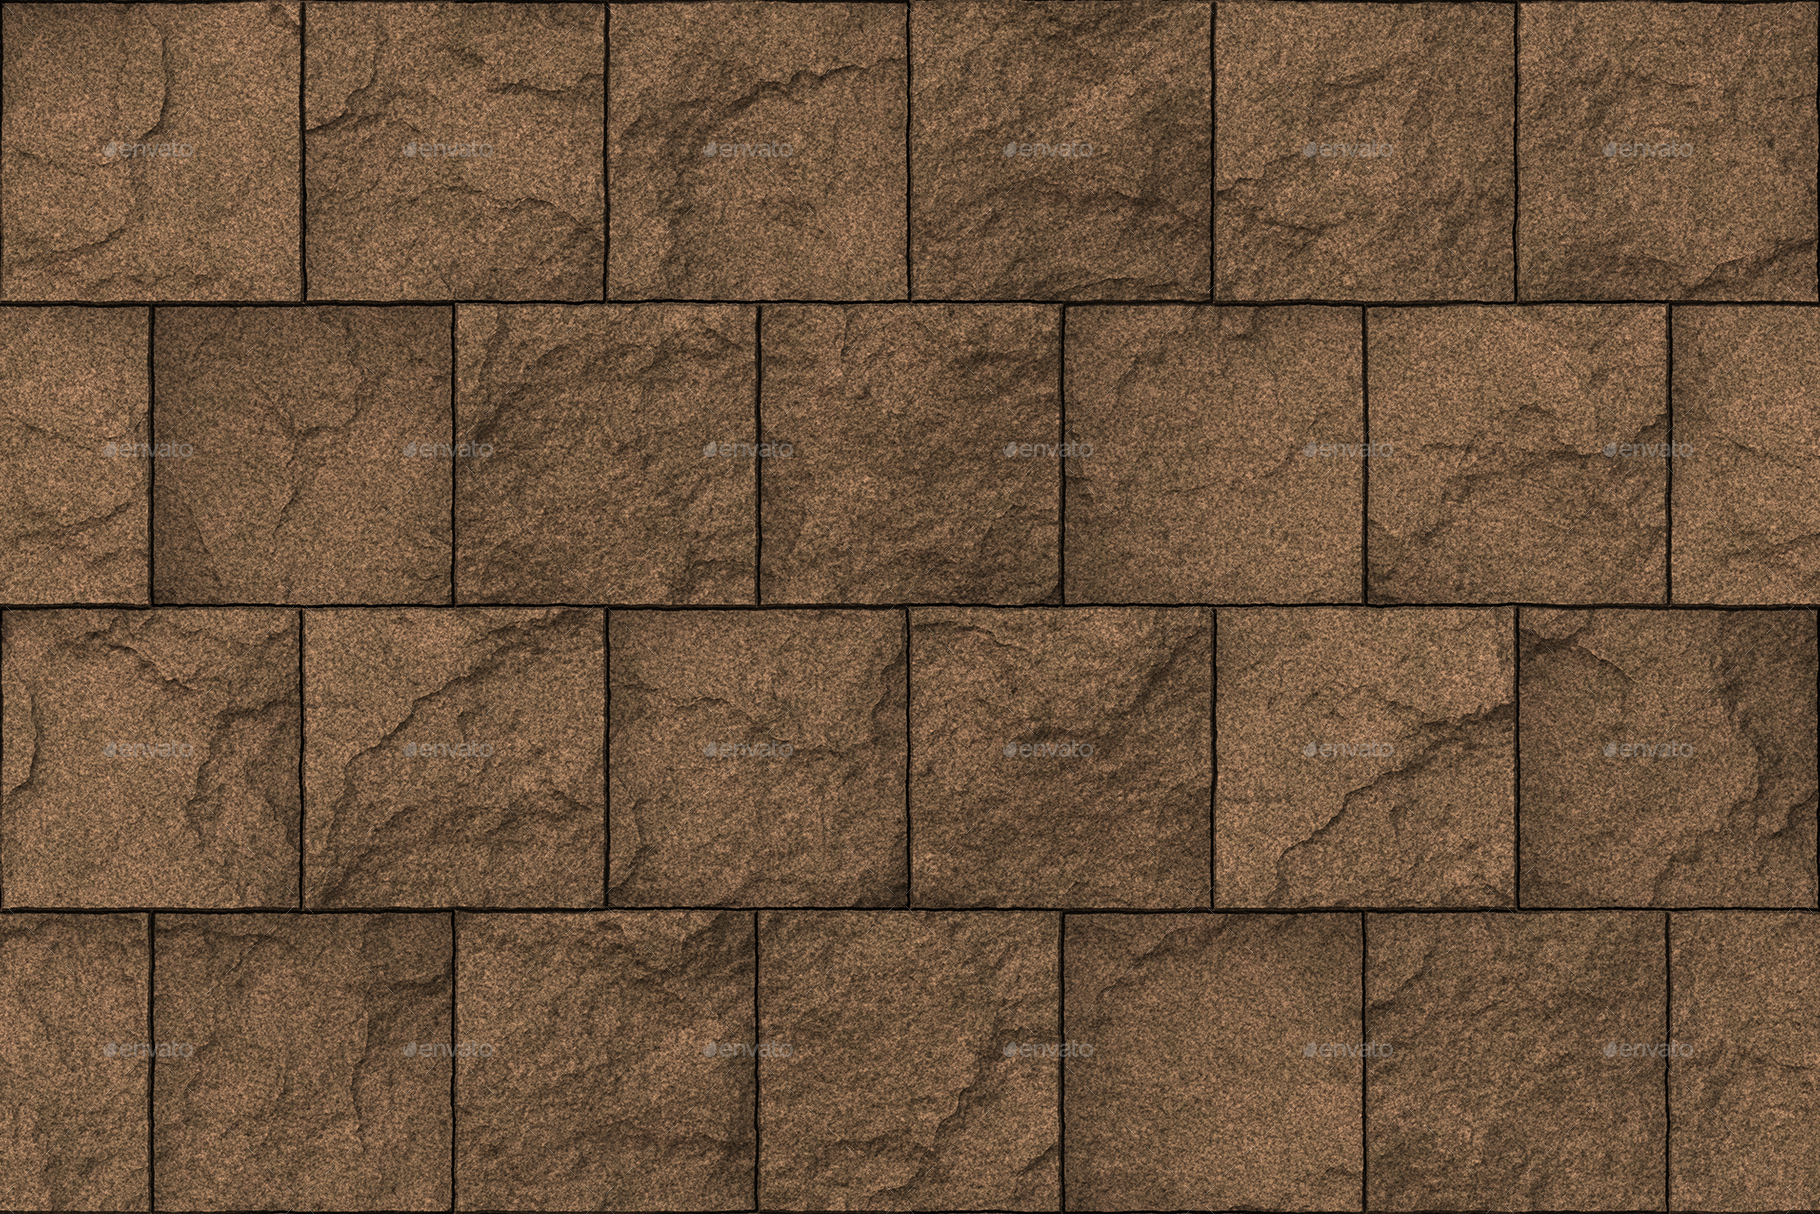 10 stone block wall